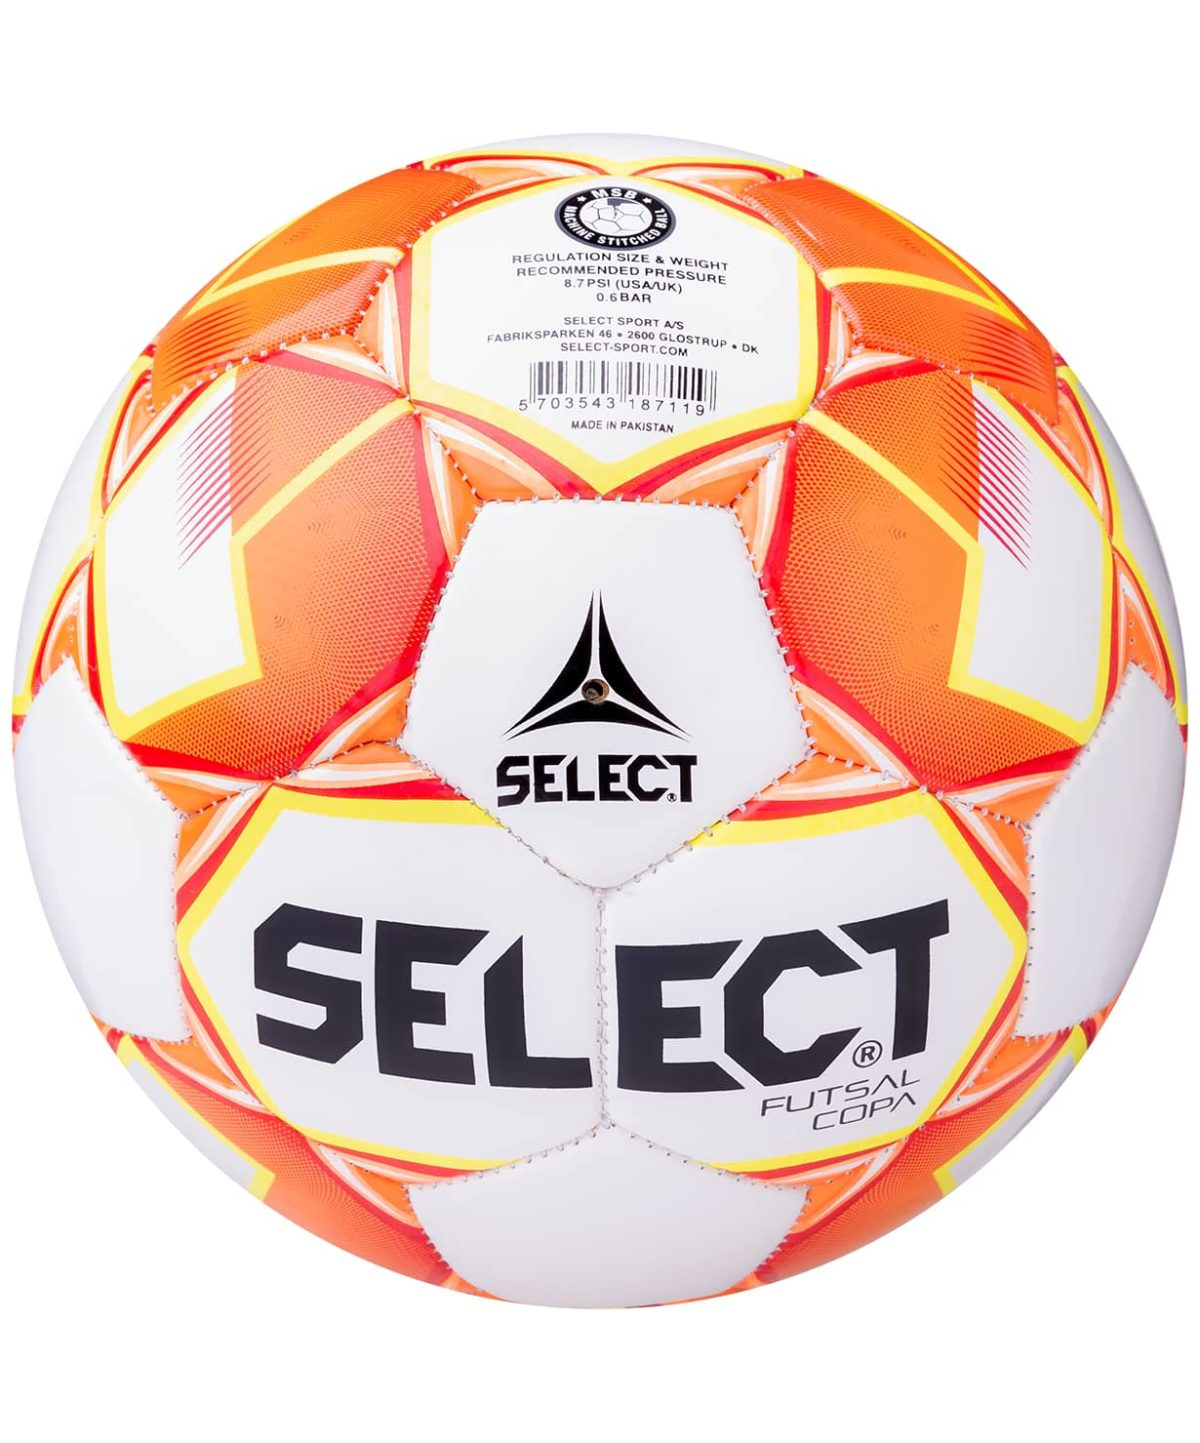 SELECT Мяч футзальный Futsal Copa  850318 №4 - 2